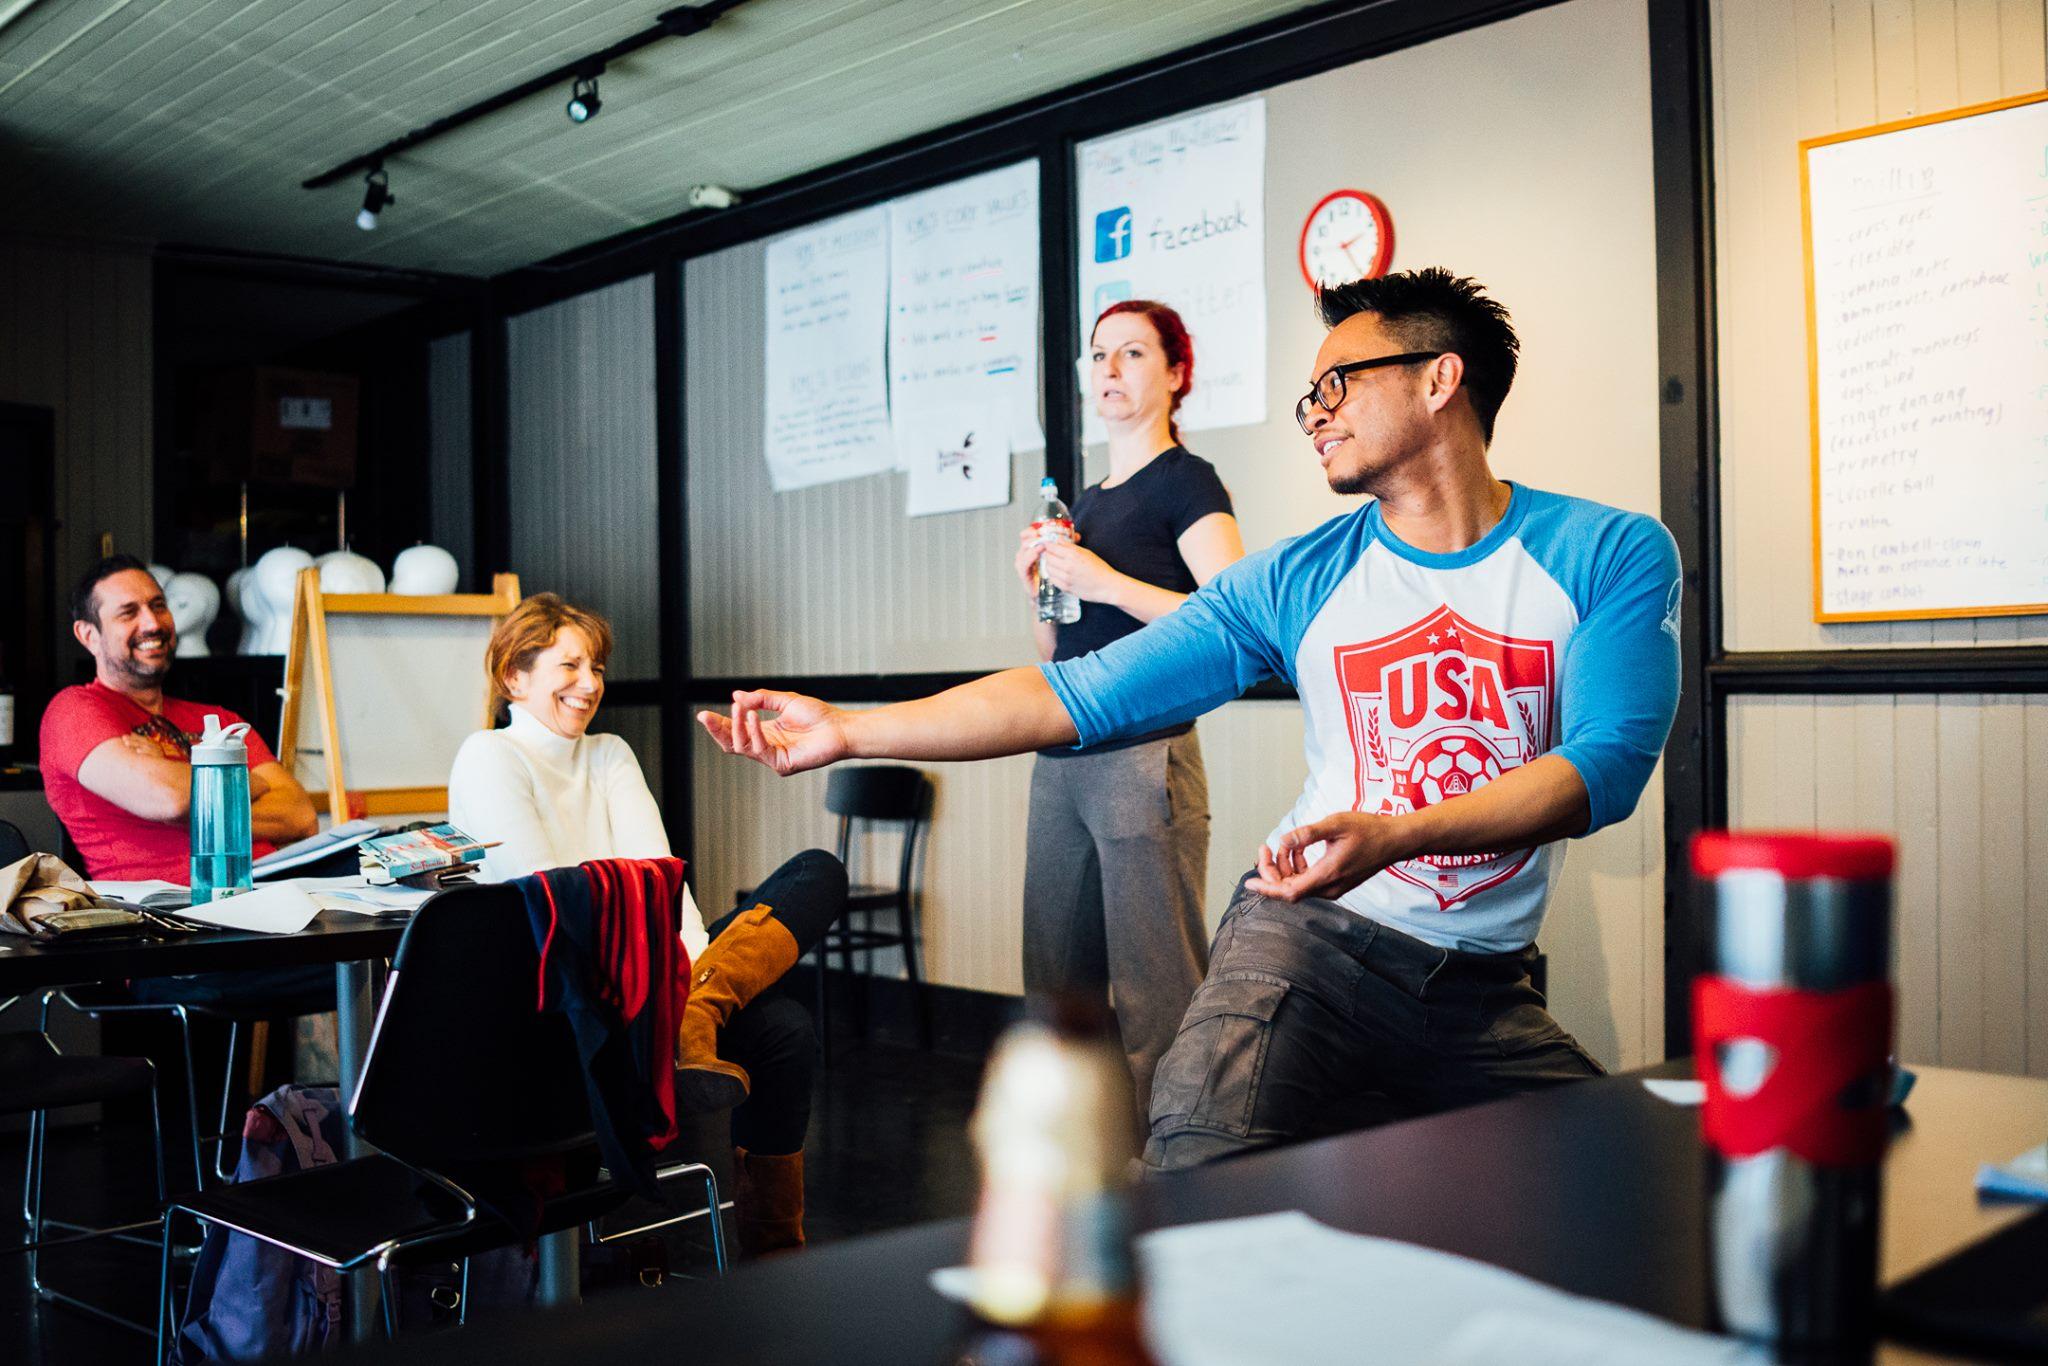 Writer Gina Bardi & actors Elaine Gavin & Justin Lucas rehearsing for Body Talk